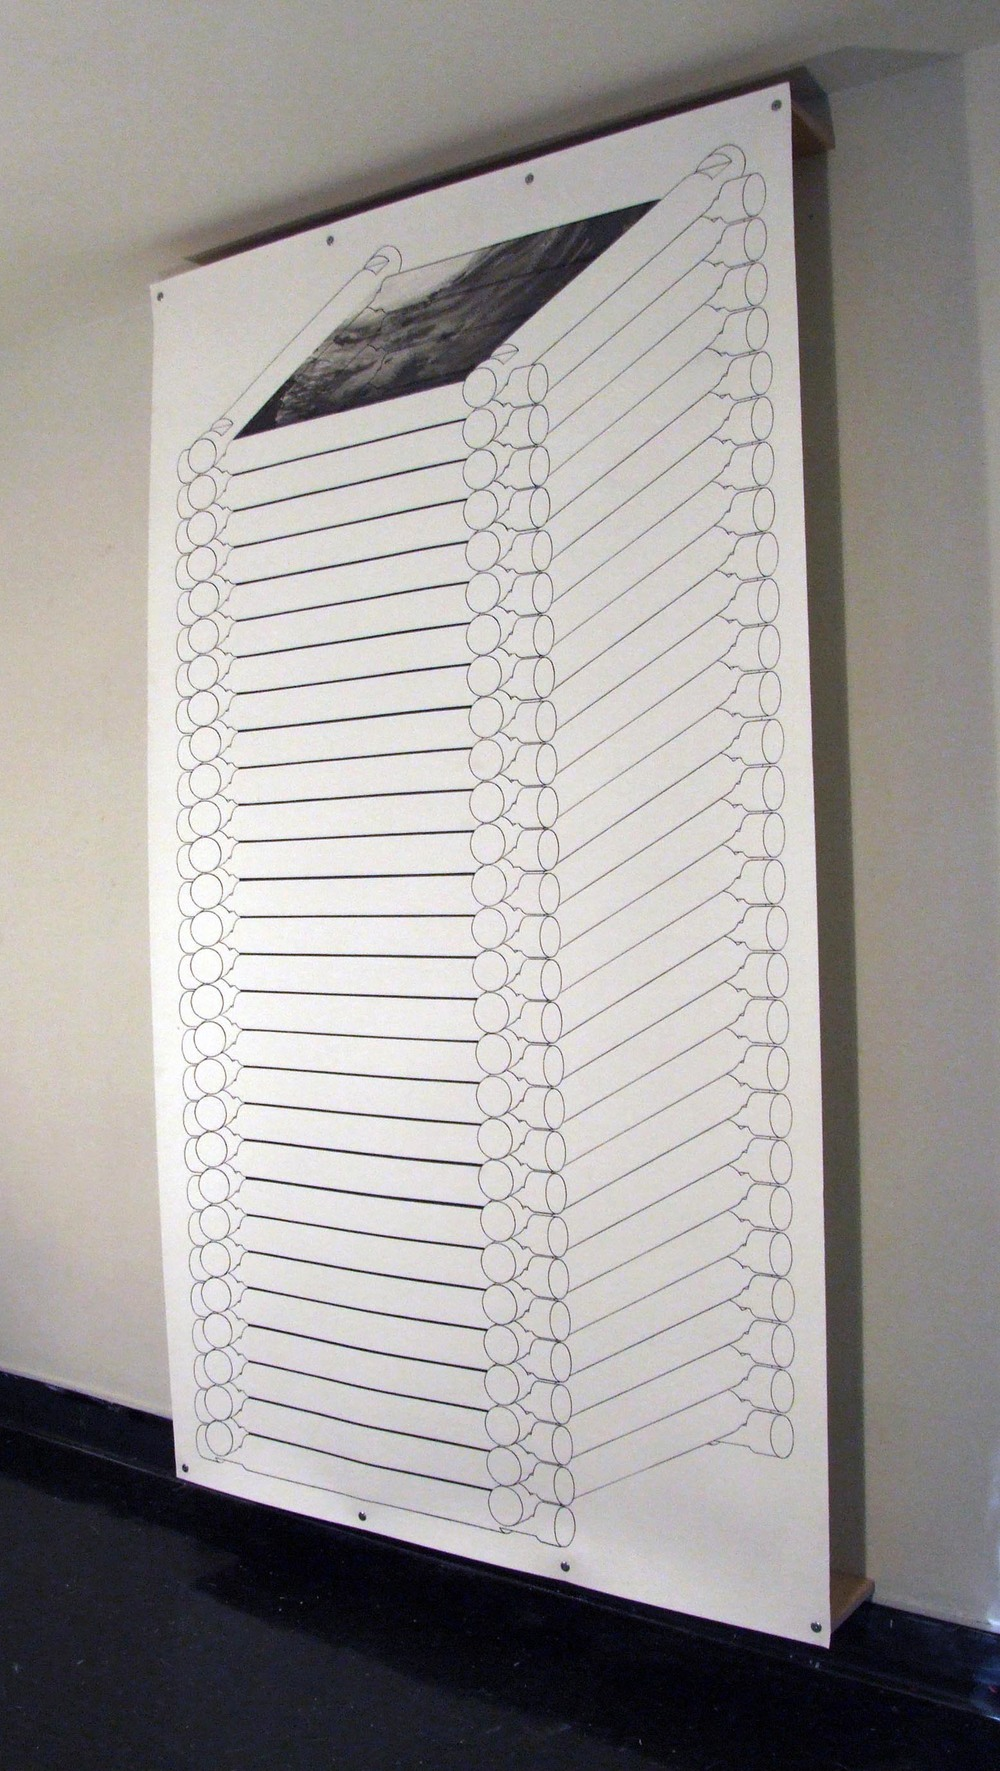 "Tower #1,installation,2011, screenprint, 8' 9"" x 5'"